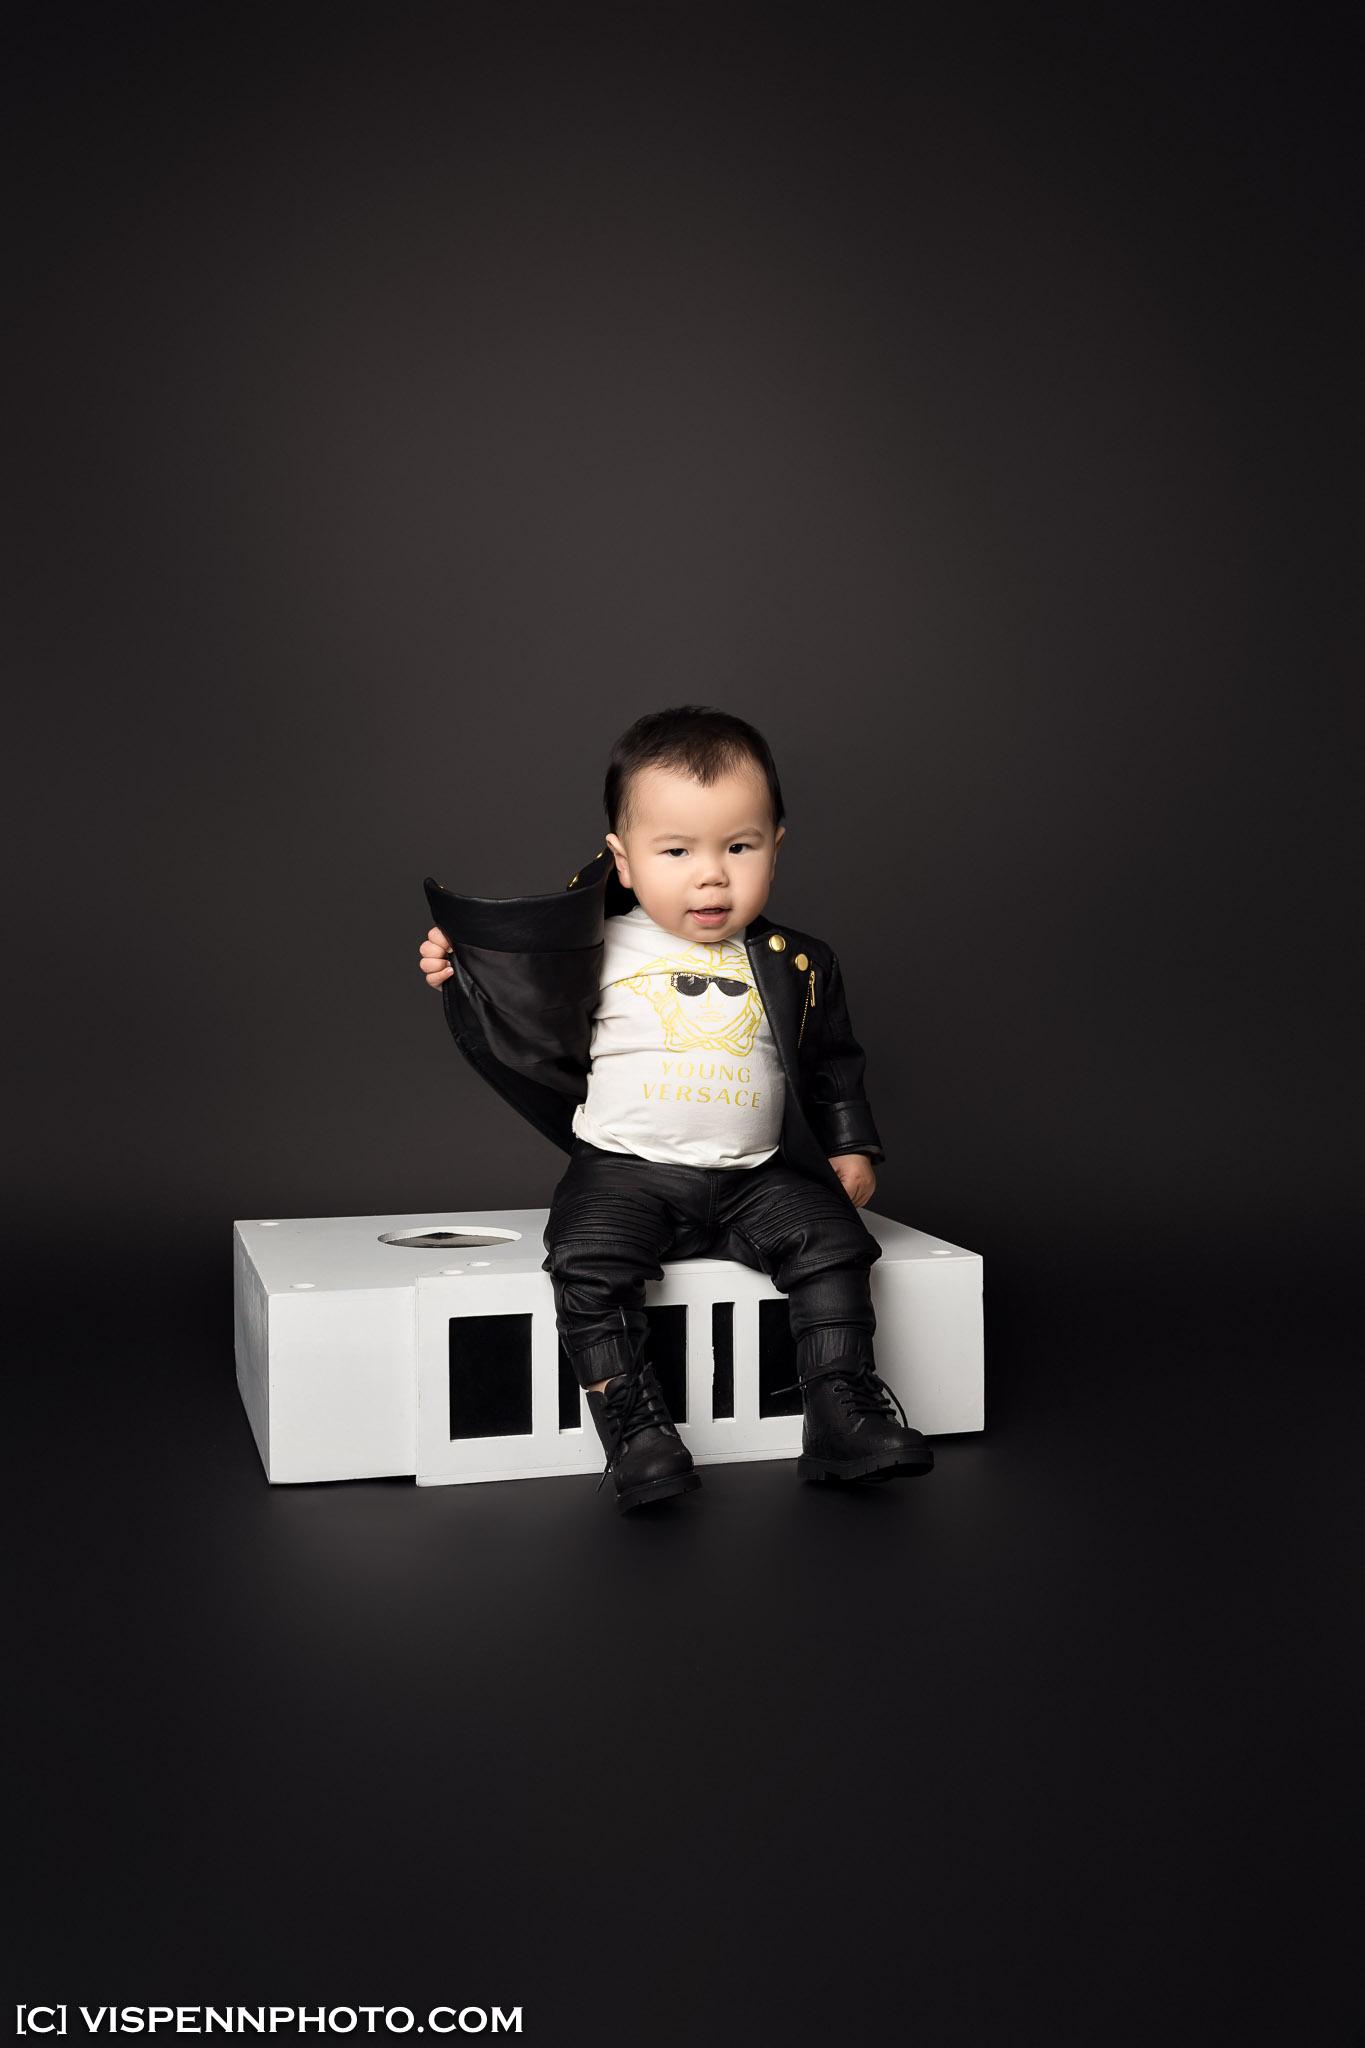 Melbourne Newborn Baby Family Photo BaoBao VISPENN 墨尔本 儿童 宝宝 百天照 满月照 孕妇照 全家福 KIDS VISPENN YoYoZhang 1329